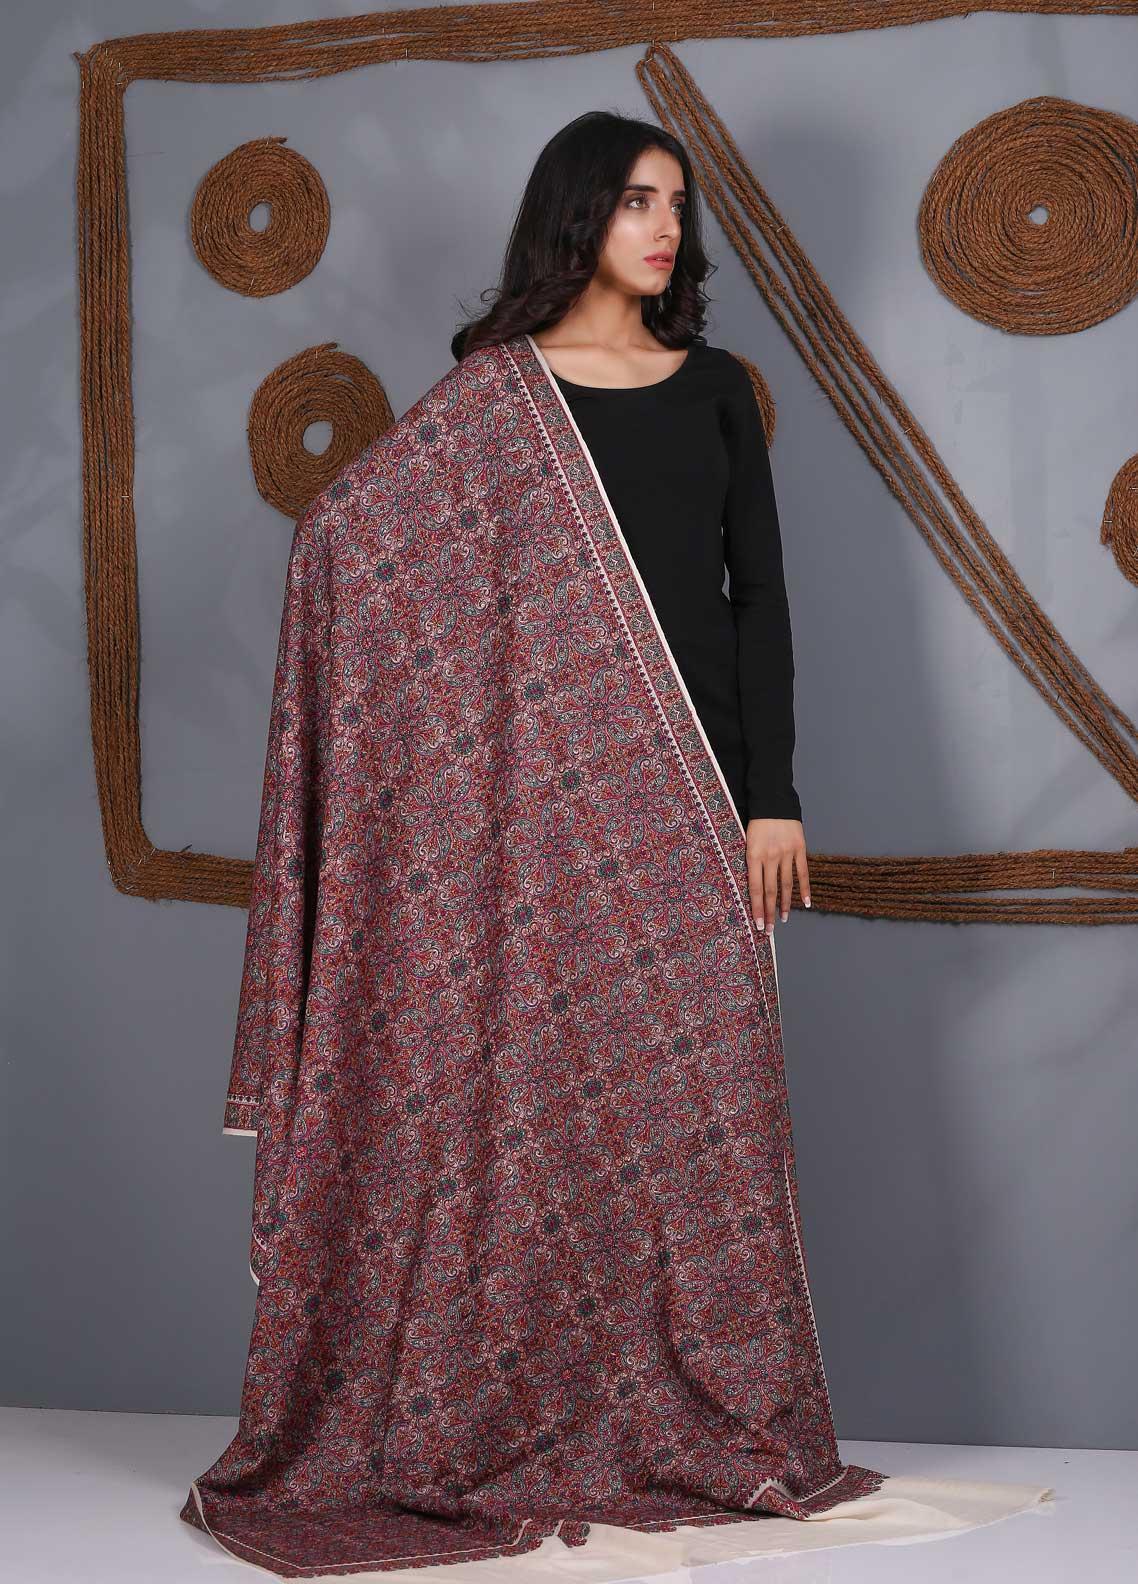 Sanaulla Exclusive Range Embroidered Pashmina Shawl SU21PS 324050 - Pashmina Shawls